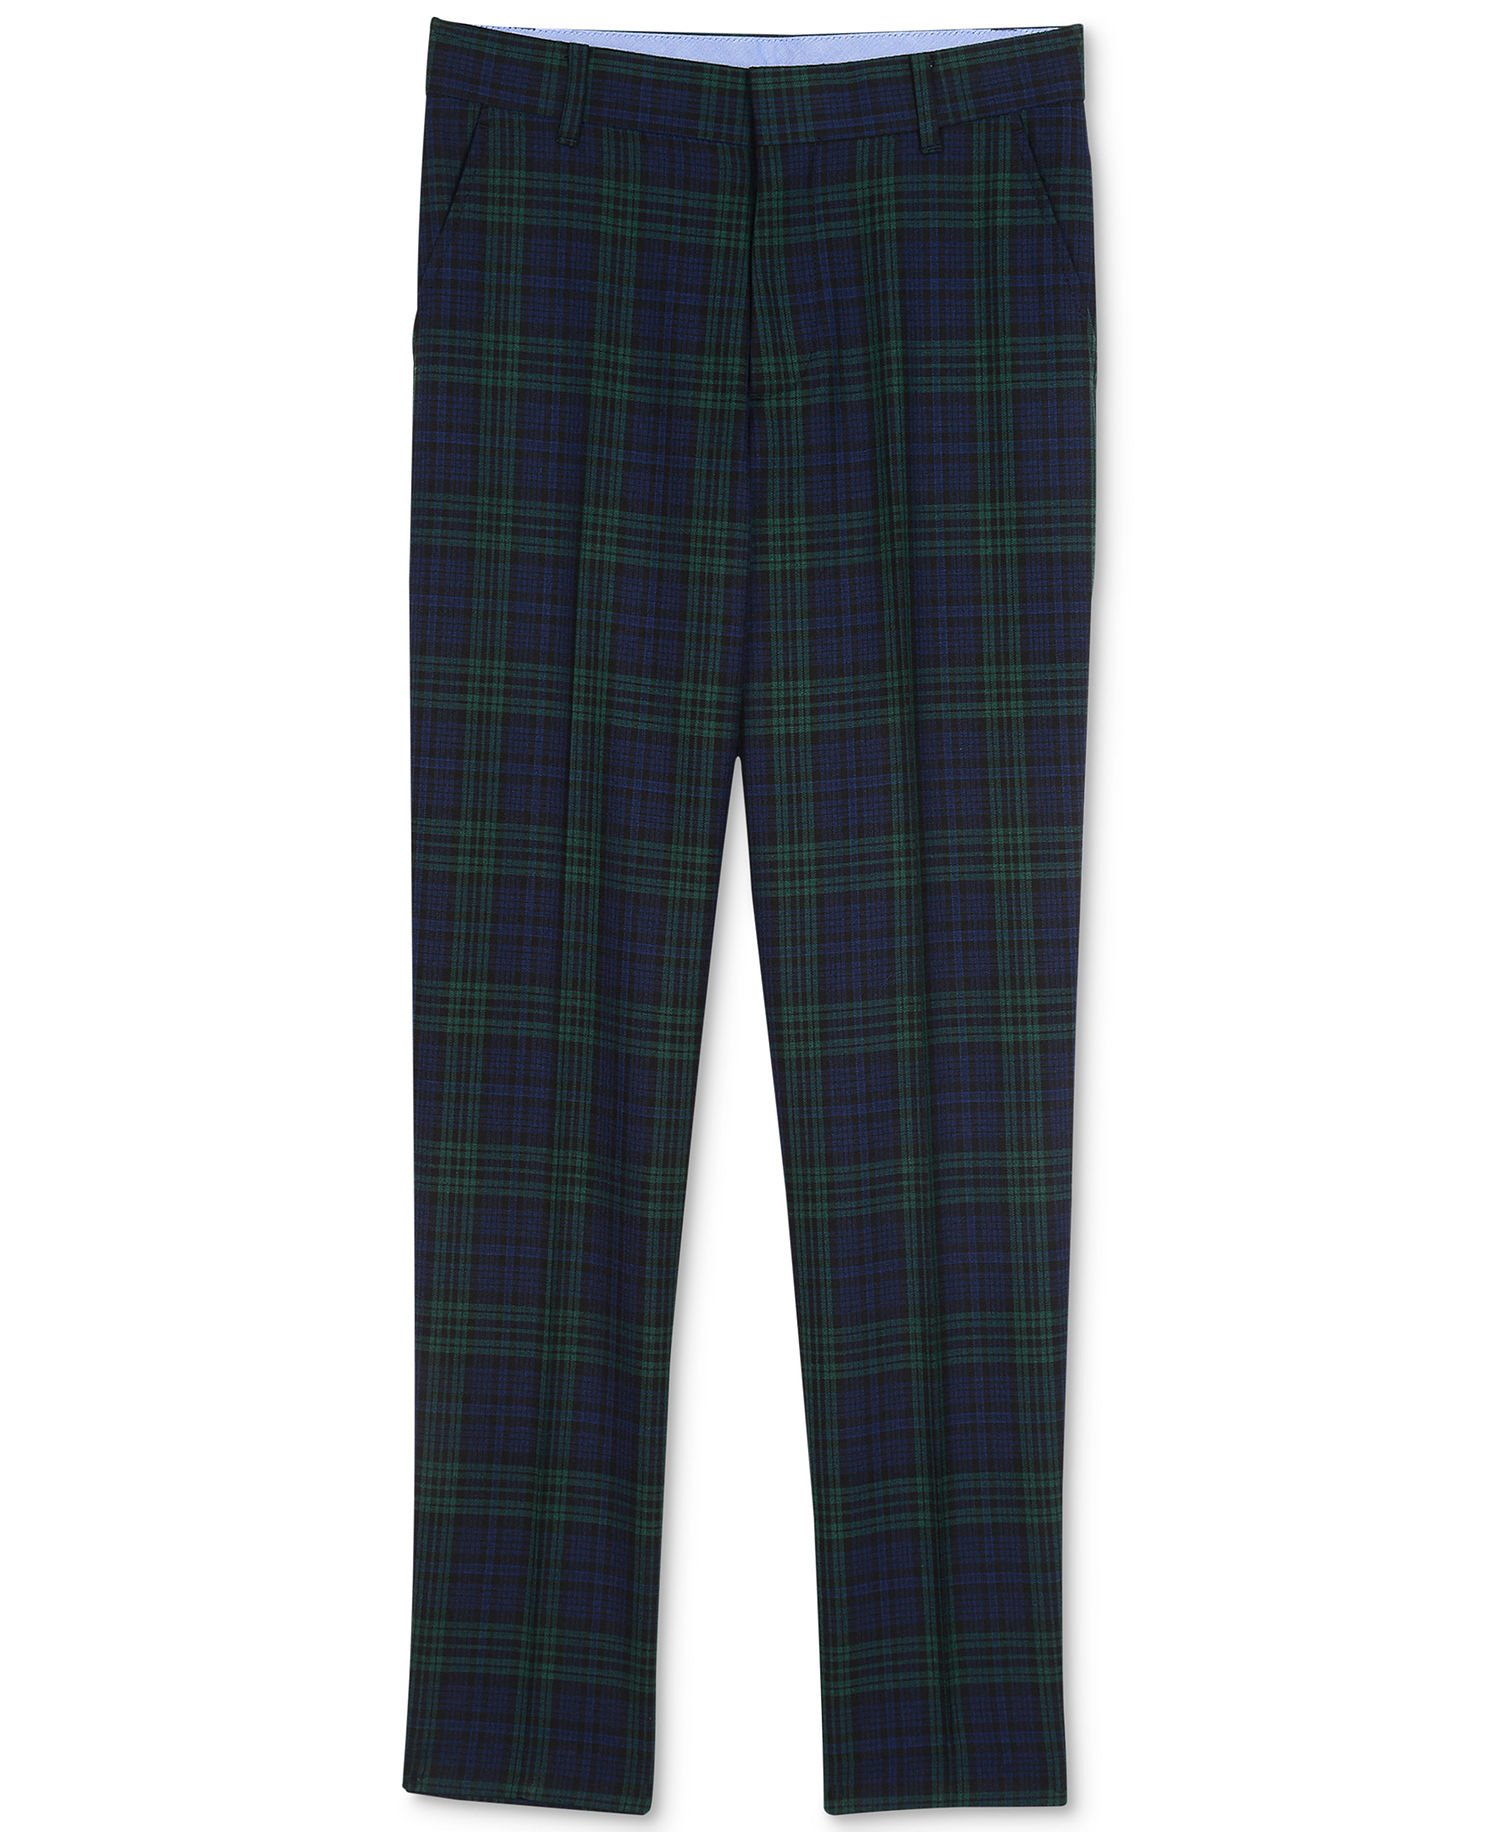 Tommy Hilfiger Big Boys' Flat Front Dress Pant, Dark Green, 12